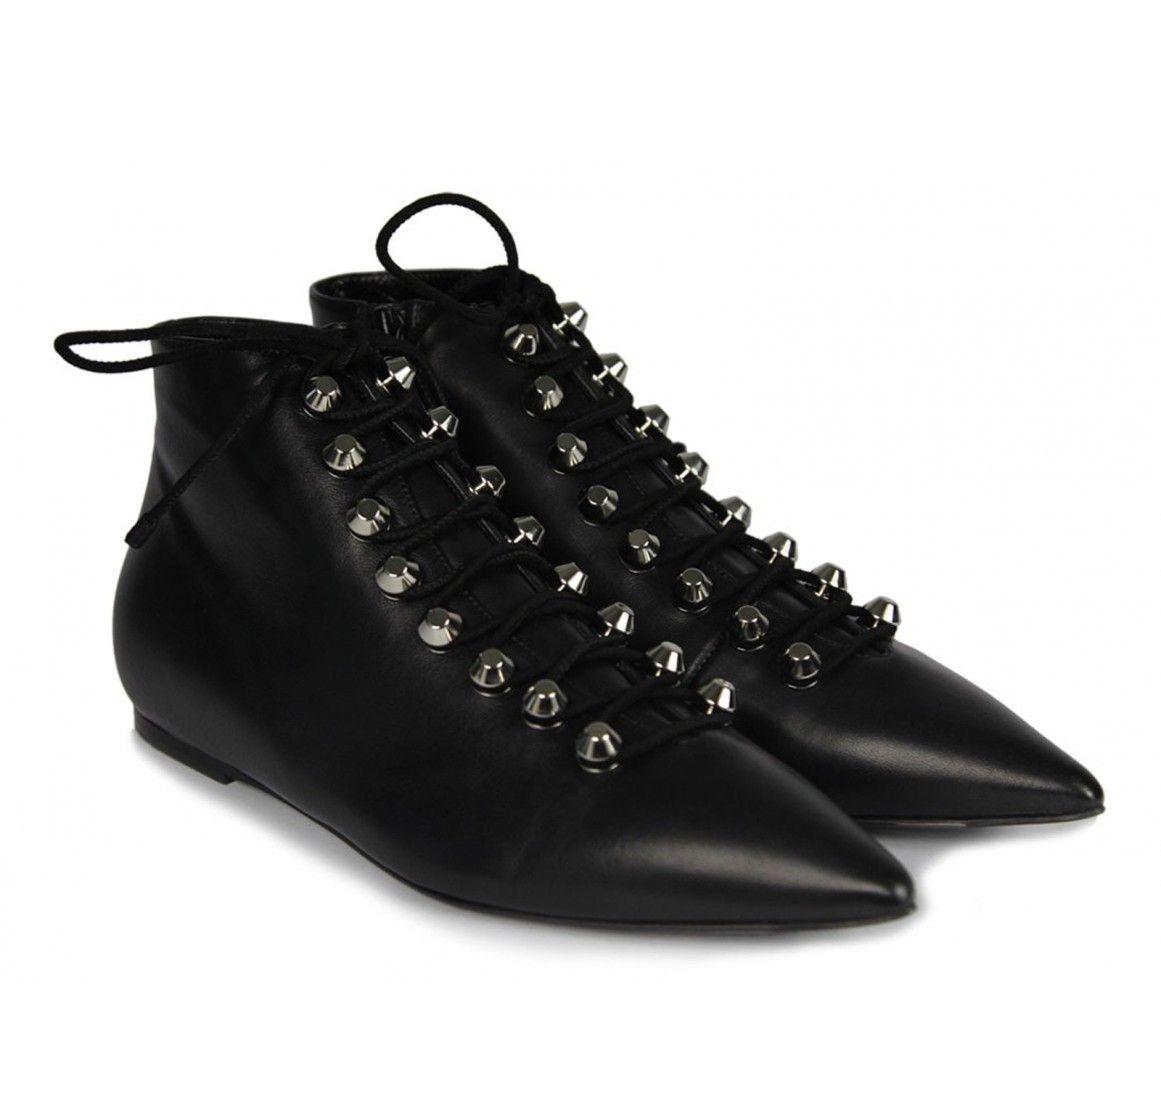 Balenciaga black lambskin ankle boots (391071 WAUQ0 1000) - Bledoncy